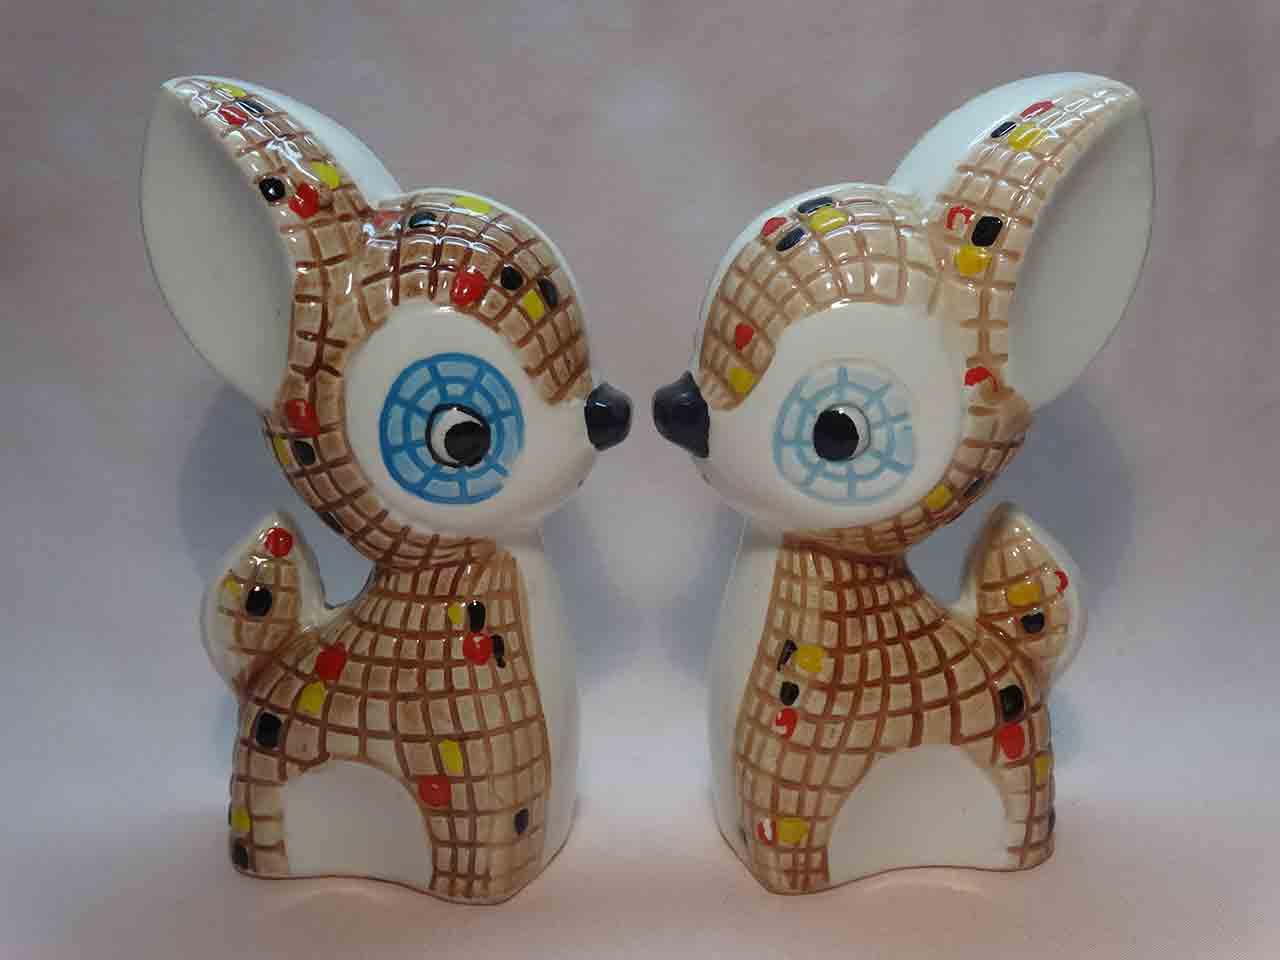 Mosaic deer salt and pepper shakers